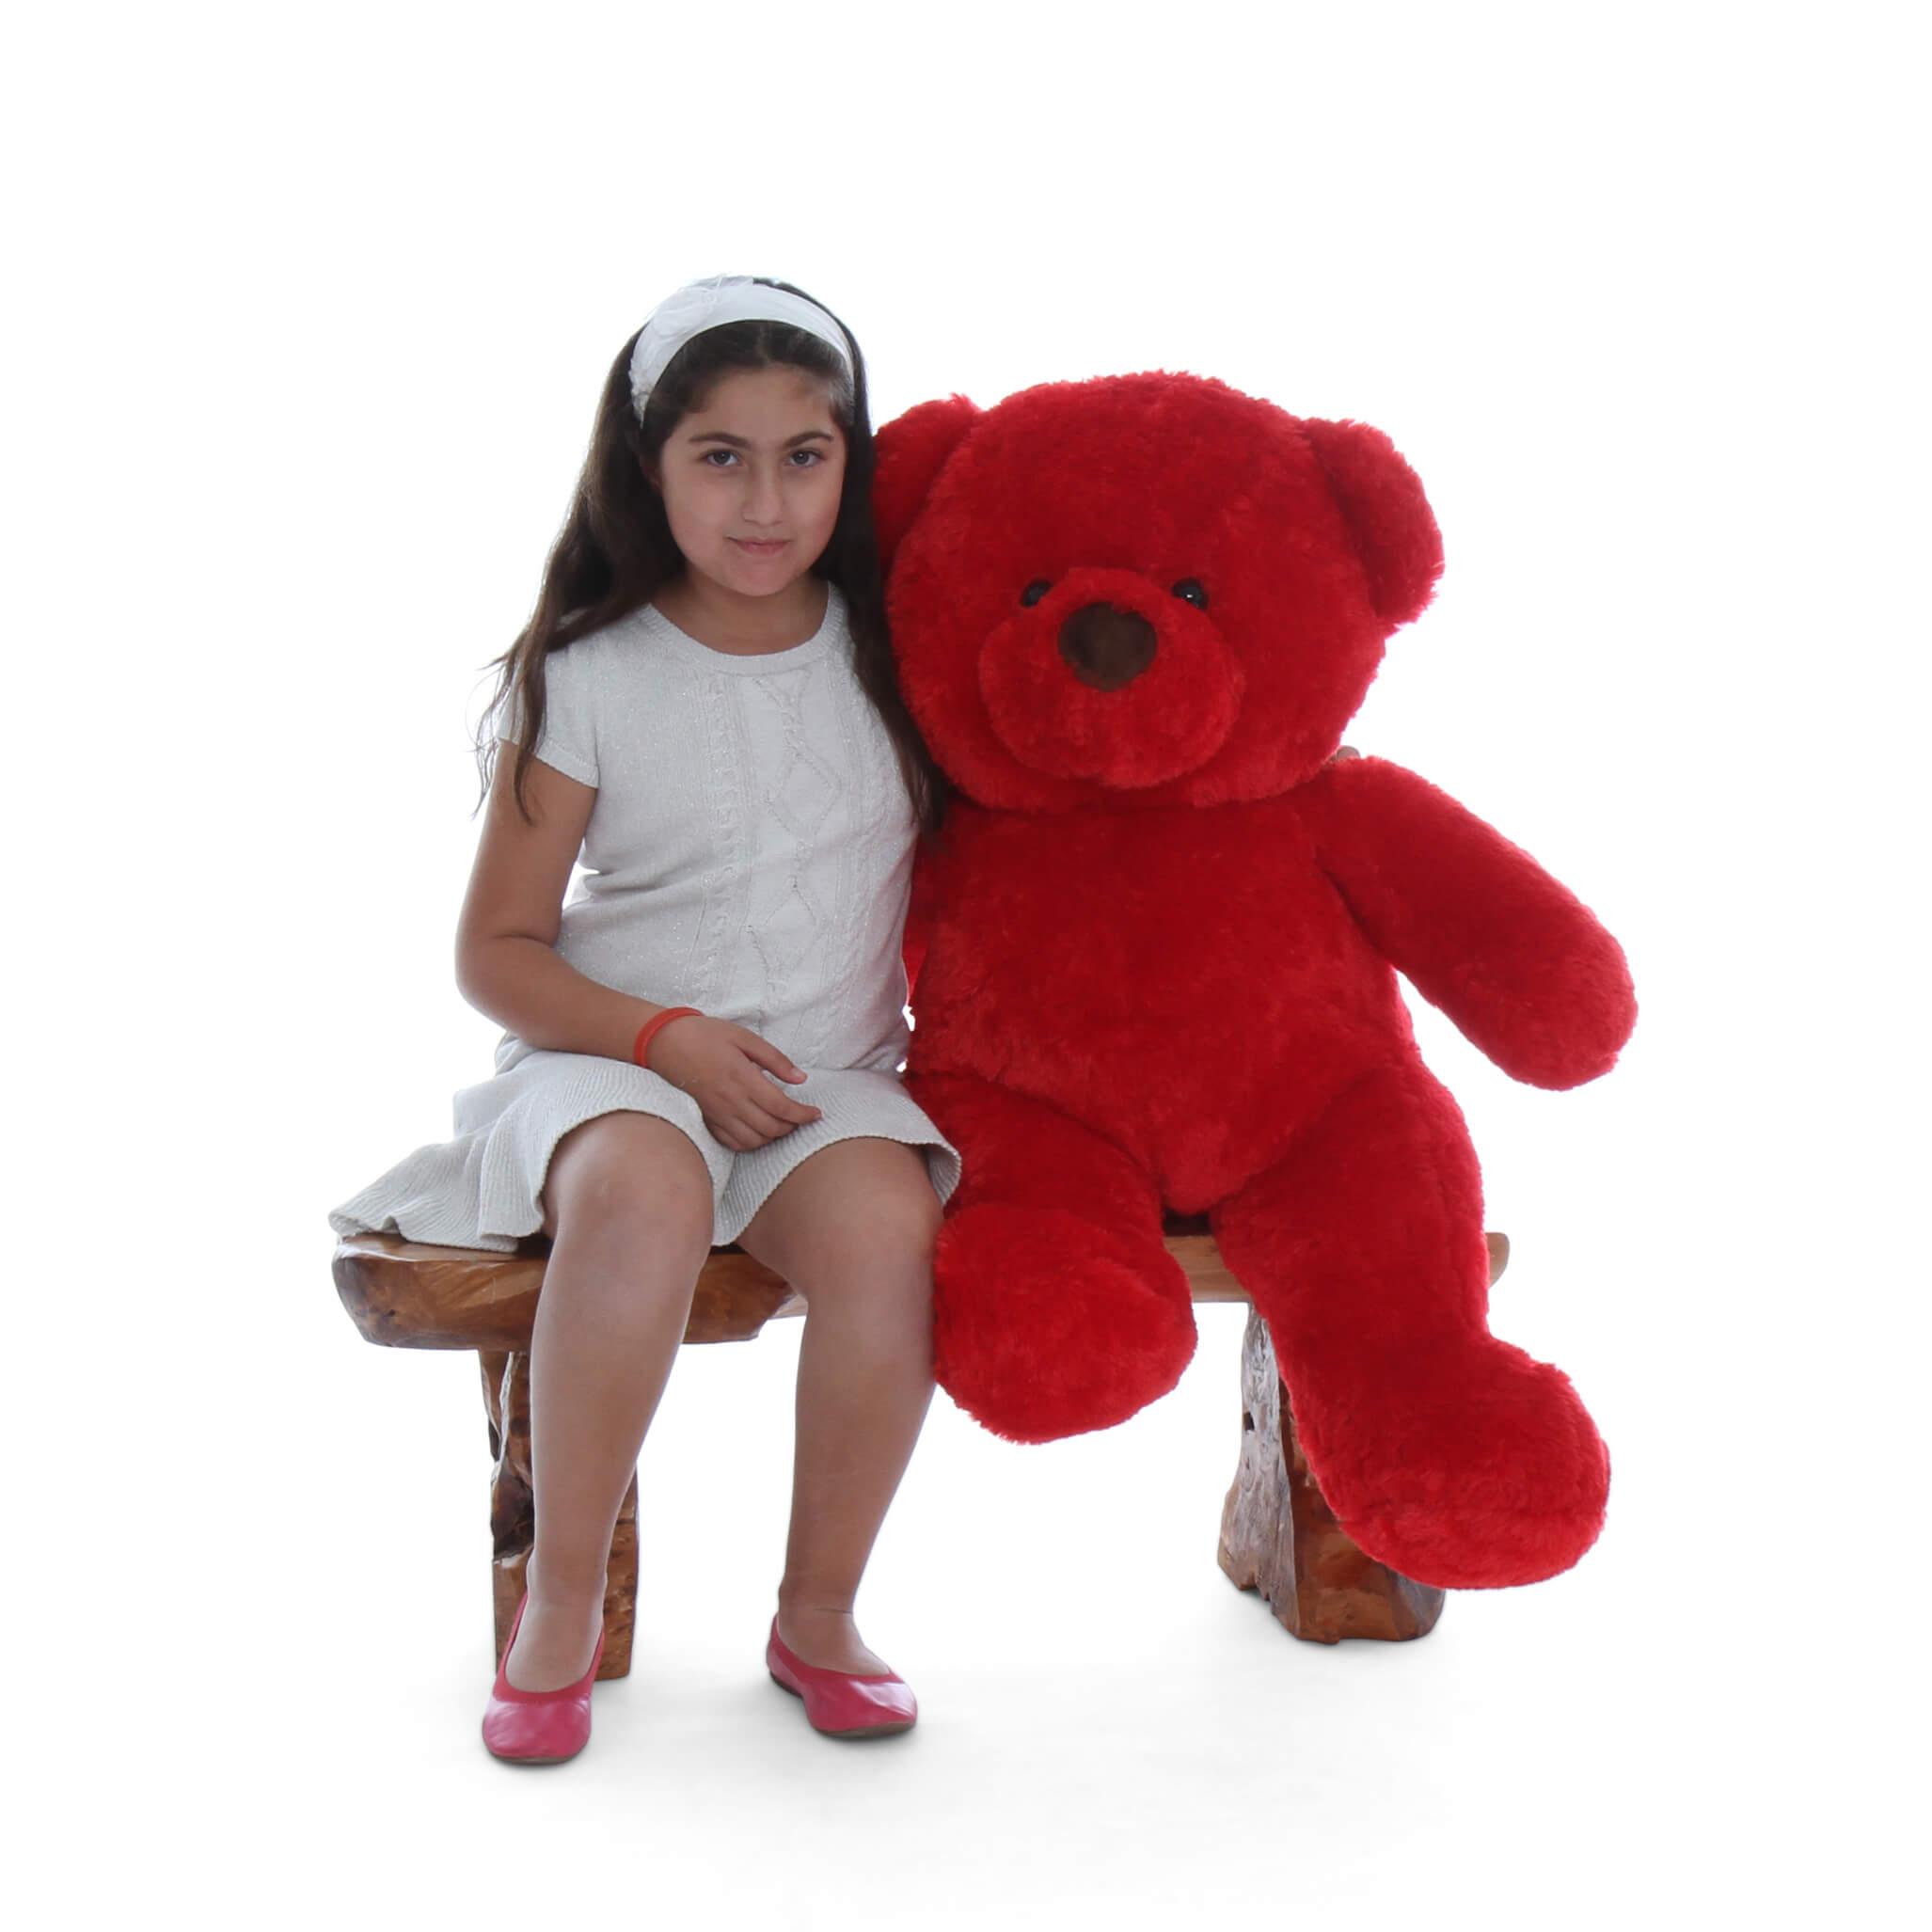 38in-big-riley-red-chubs-adorable-teddy-bear-stuffed-animal-1.jpg